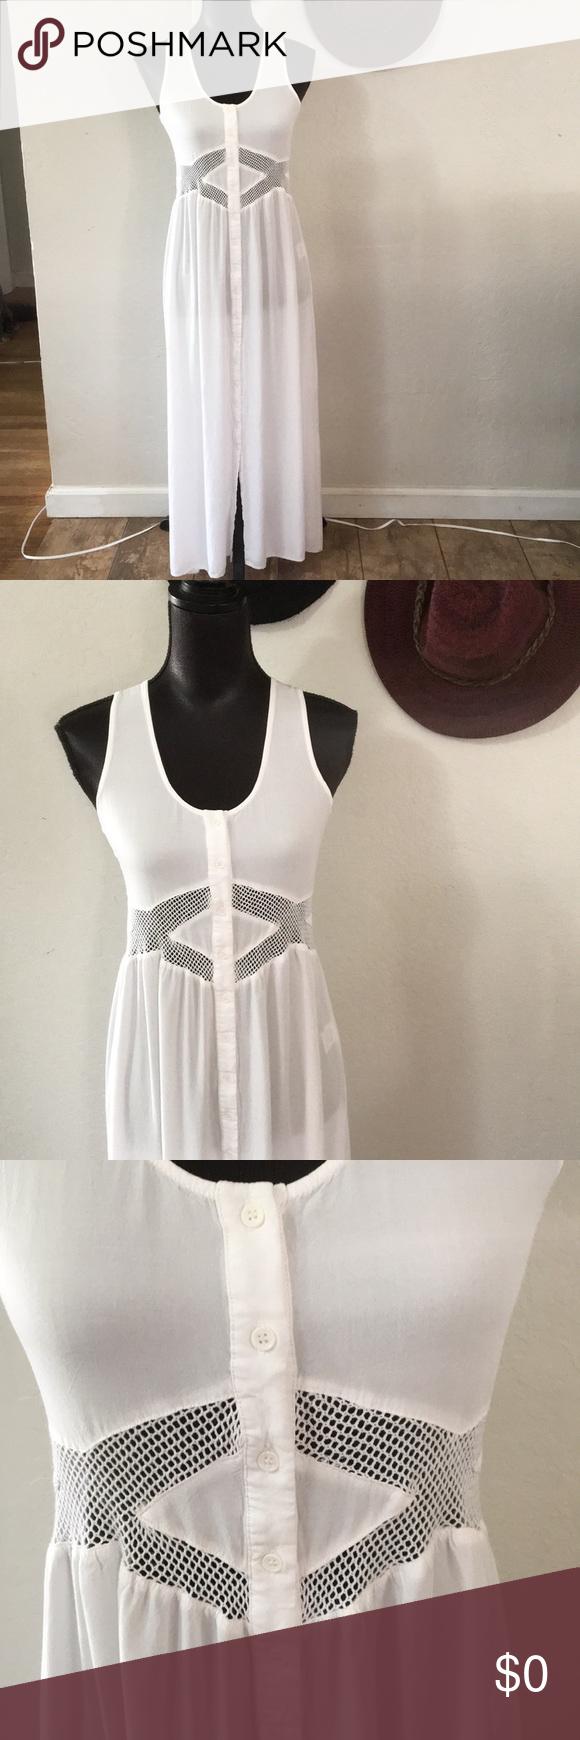 EUC Summer dress by Knot Sisters Summer dresses, Cute